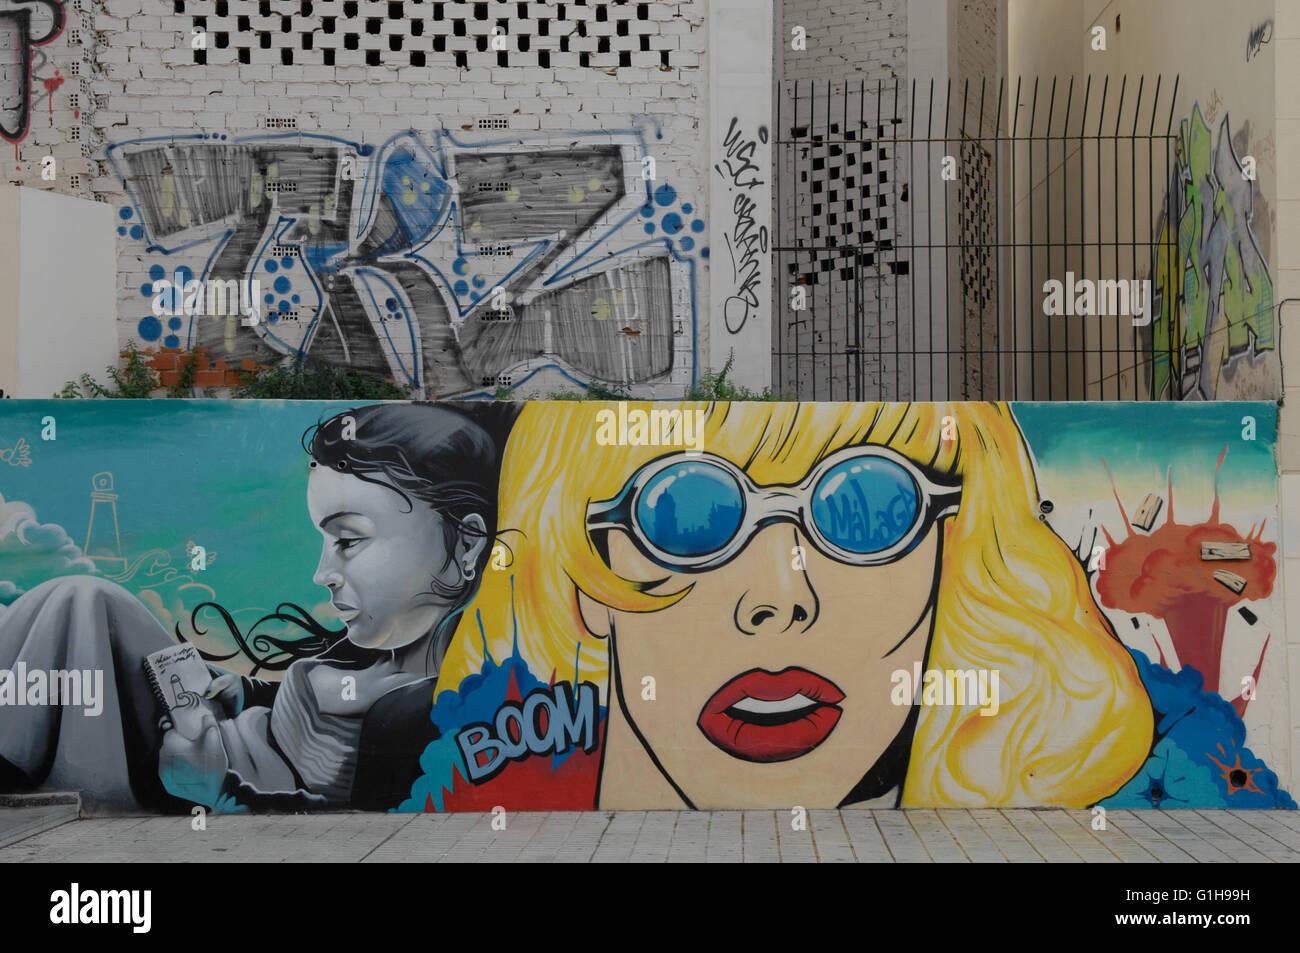 graffiti, street, view, Malaga Spain - Stock Image